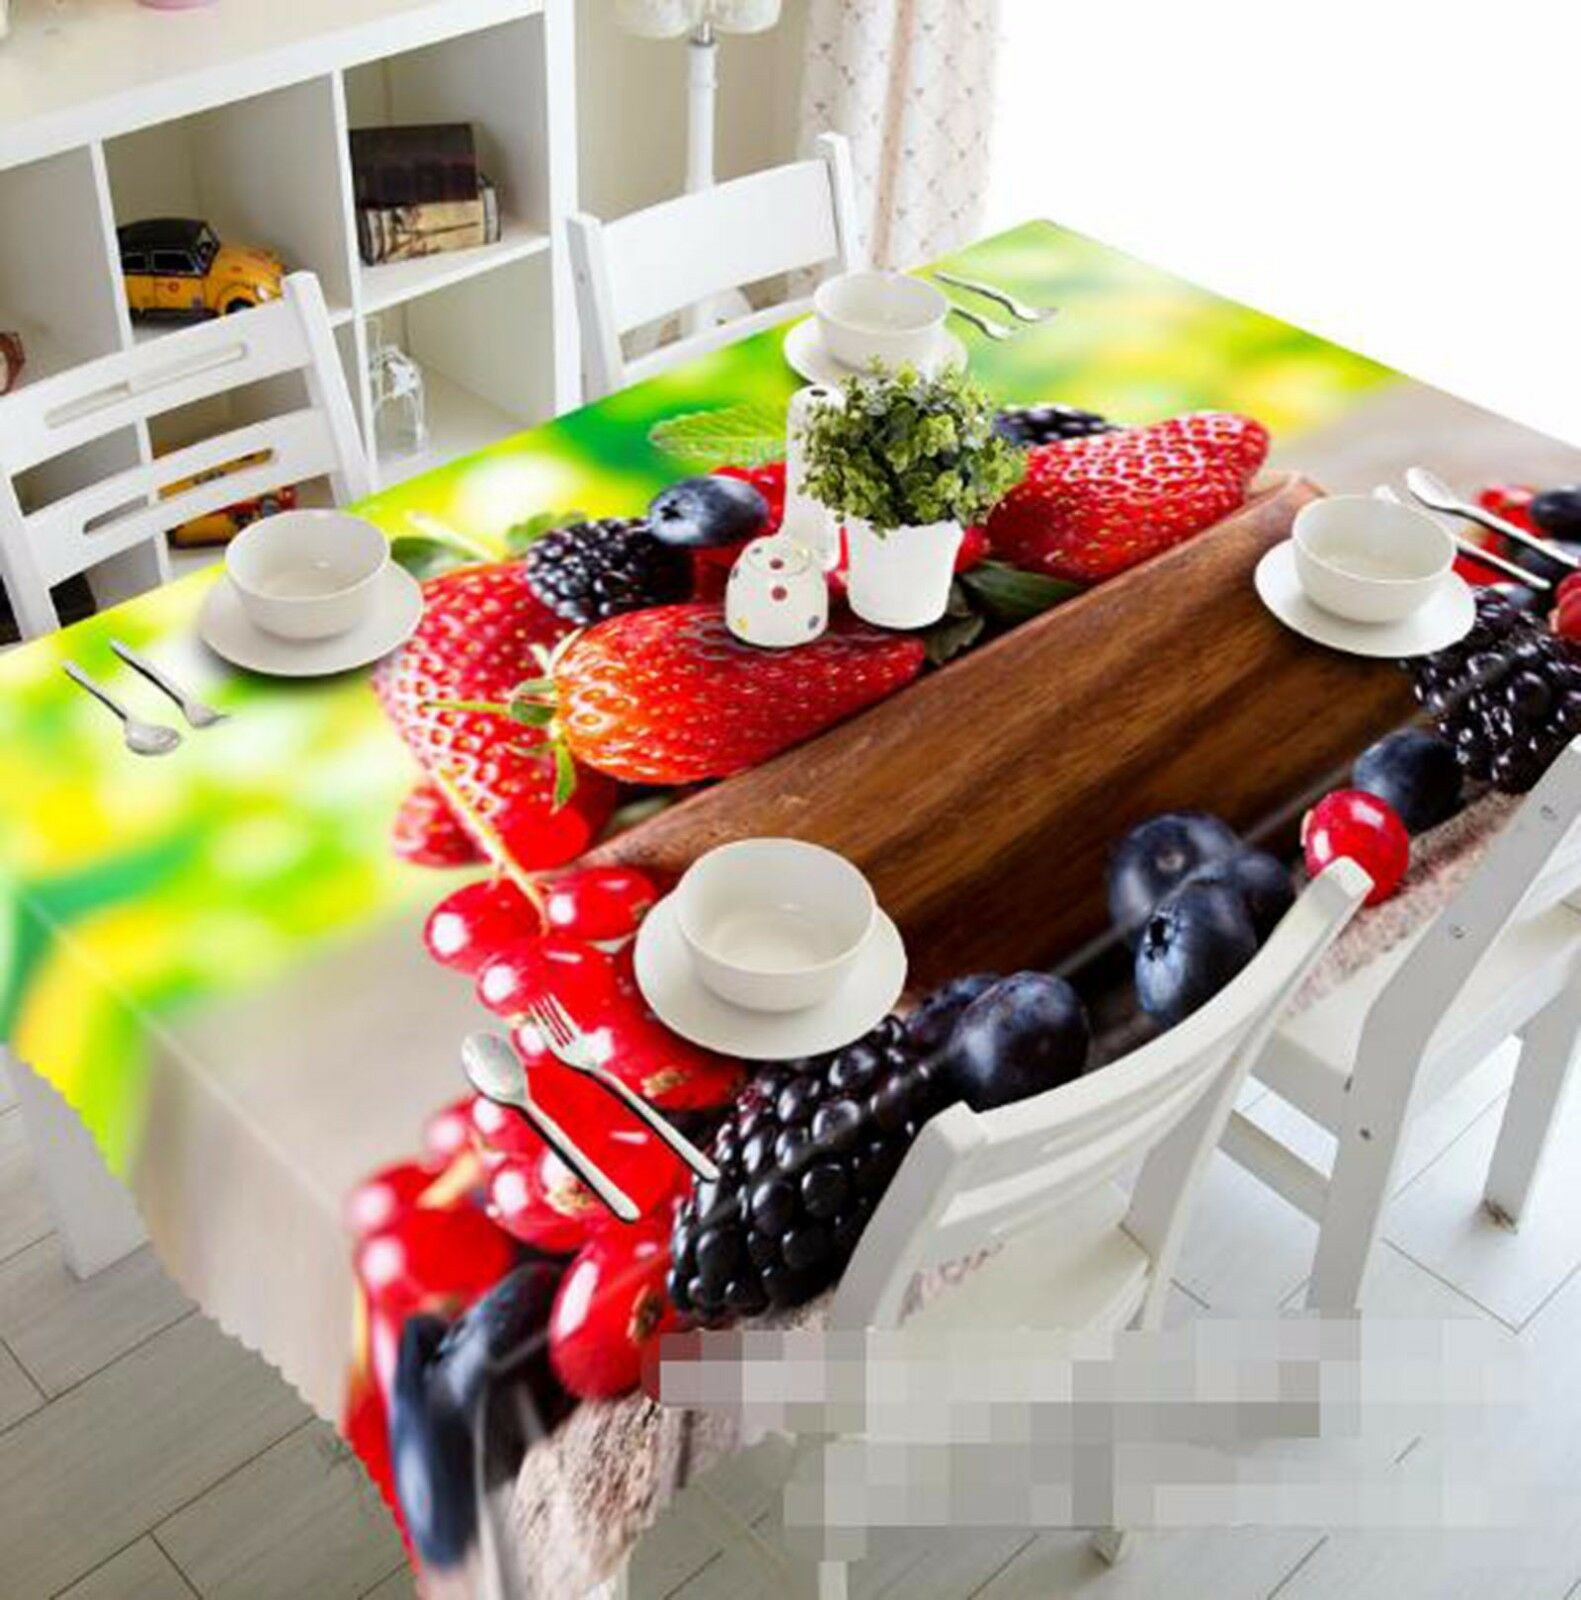 3D Fruit Farbe Tablecloth Table Cover Cloth Birthday Party AJ WALLPAPER UK Lemon